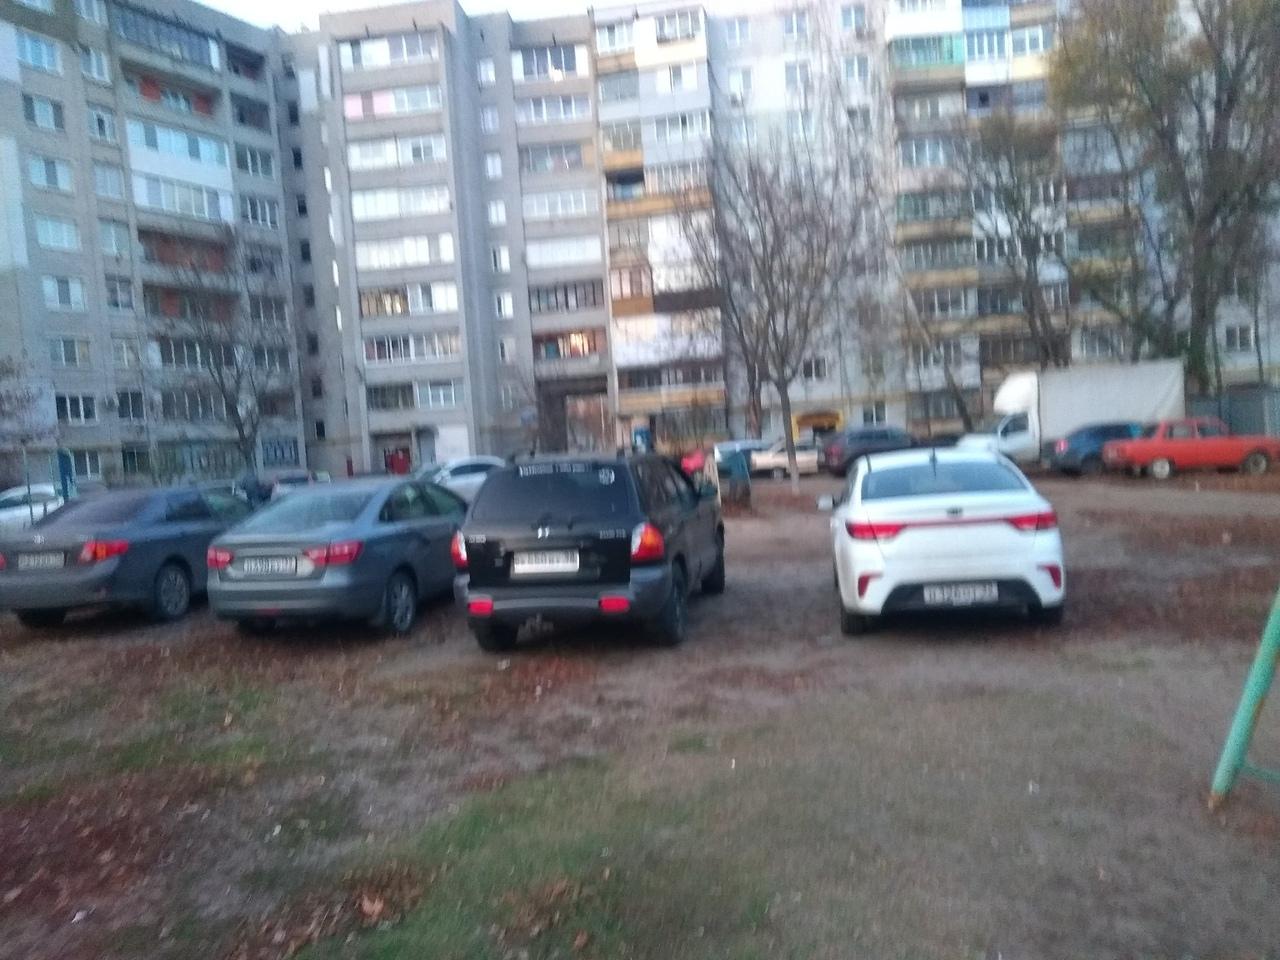 В Брянске парковкой заняли детскую площадку